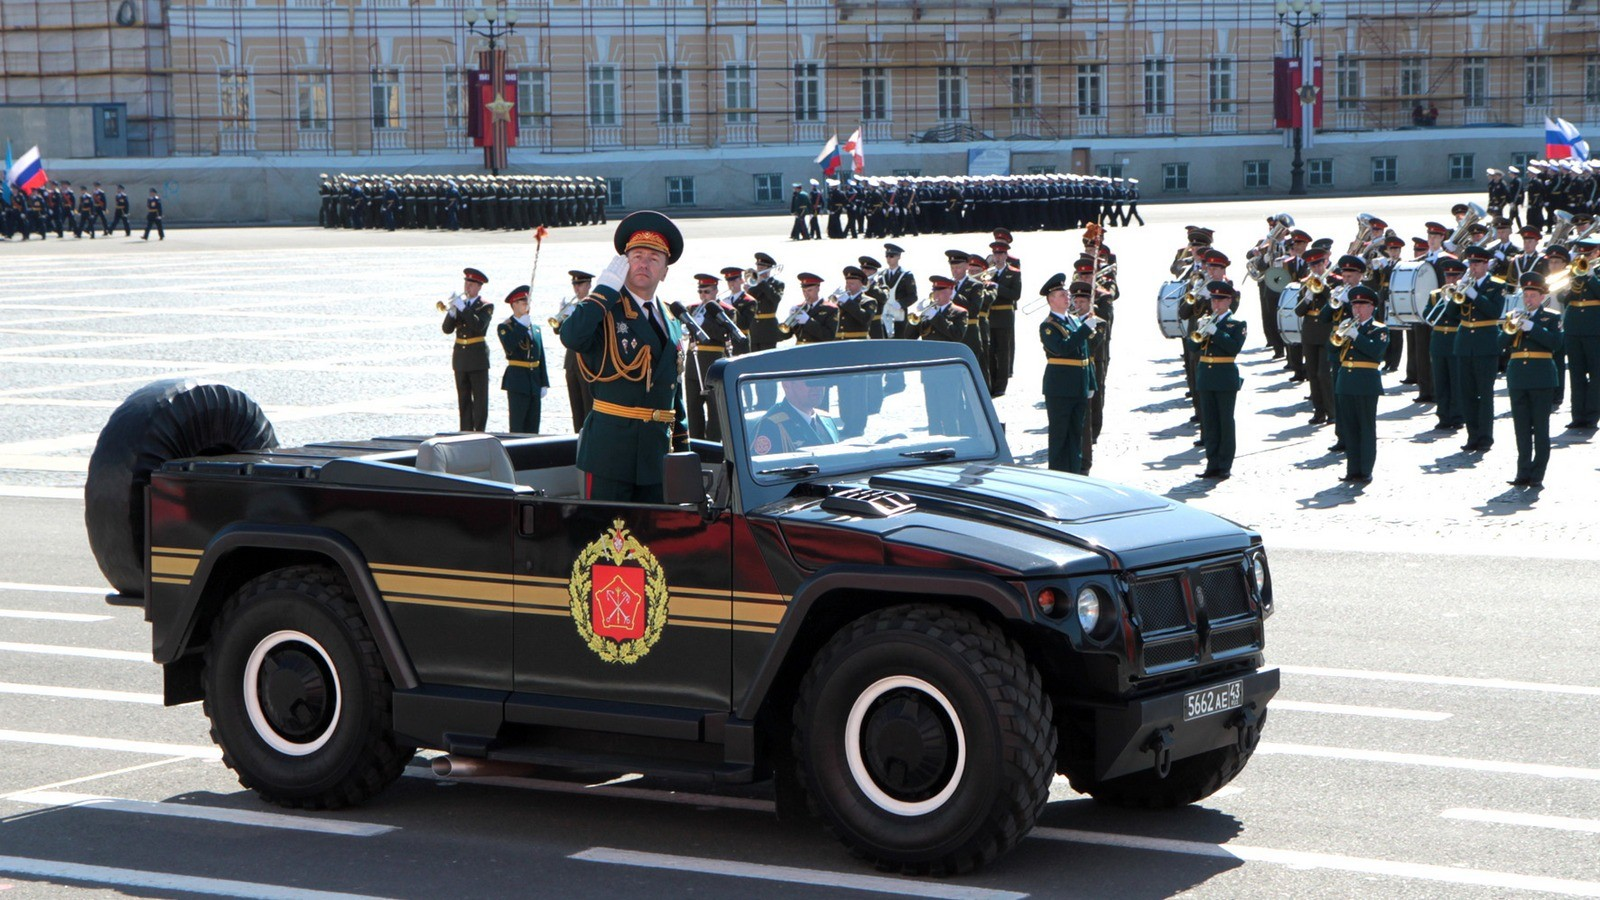 Машина СП46 «Тигр» на Дворцовой площади Санкт-Петербурга. 2012 год